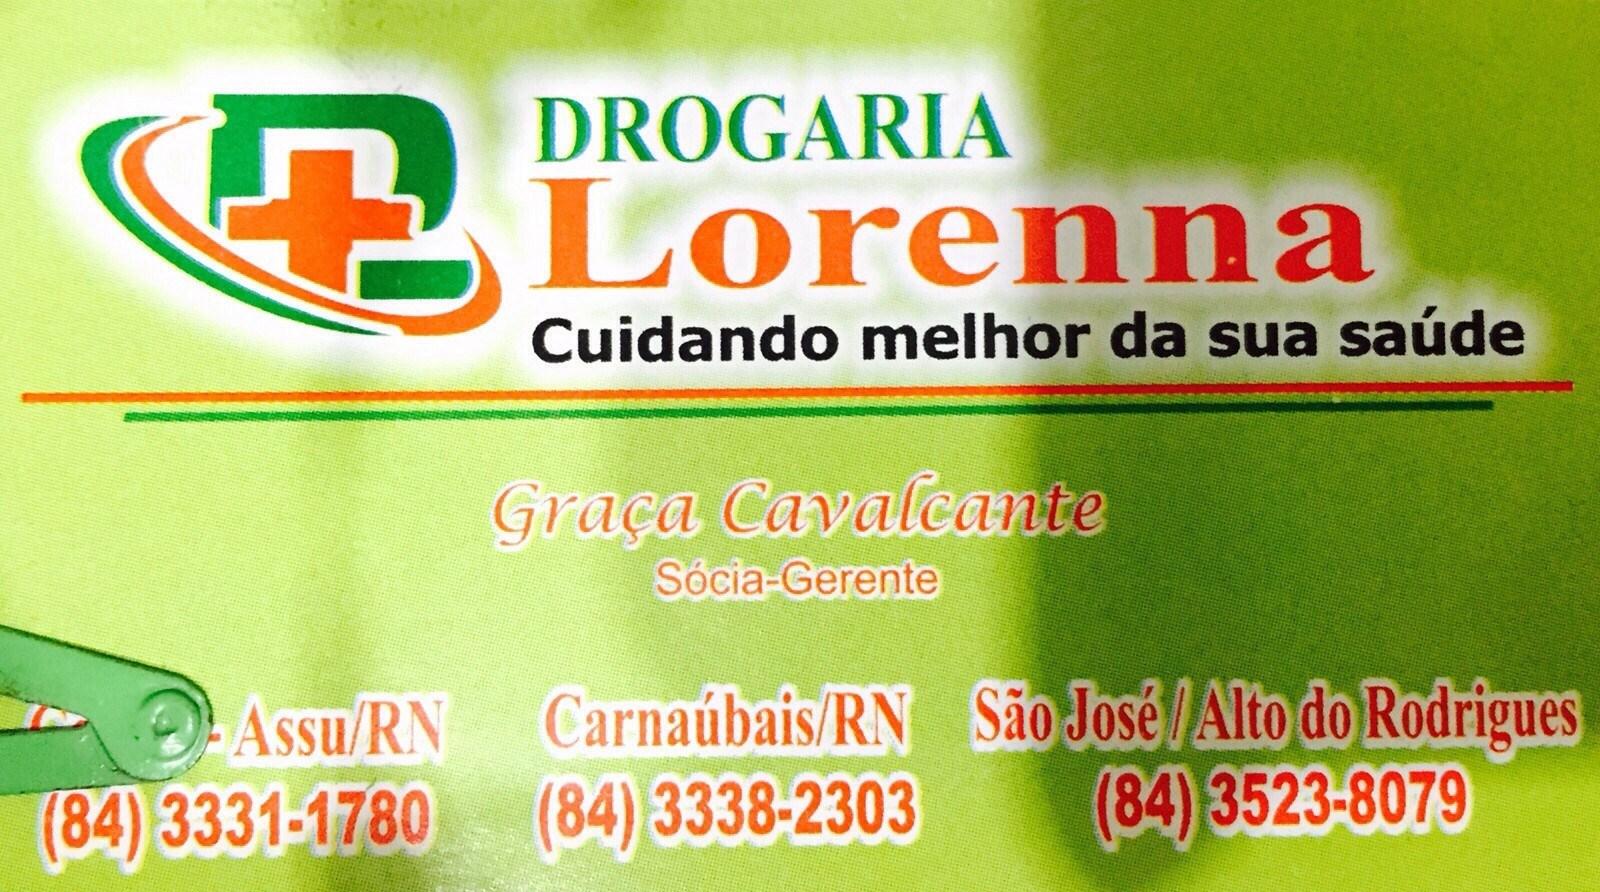 Drogaria Lorena